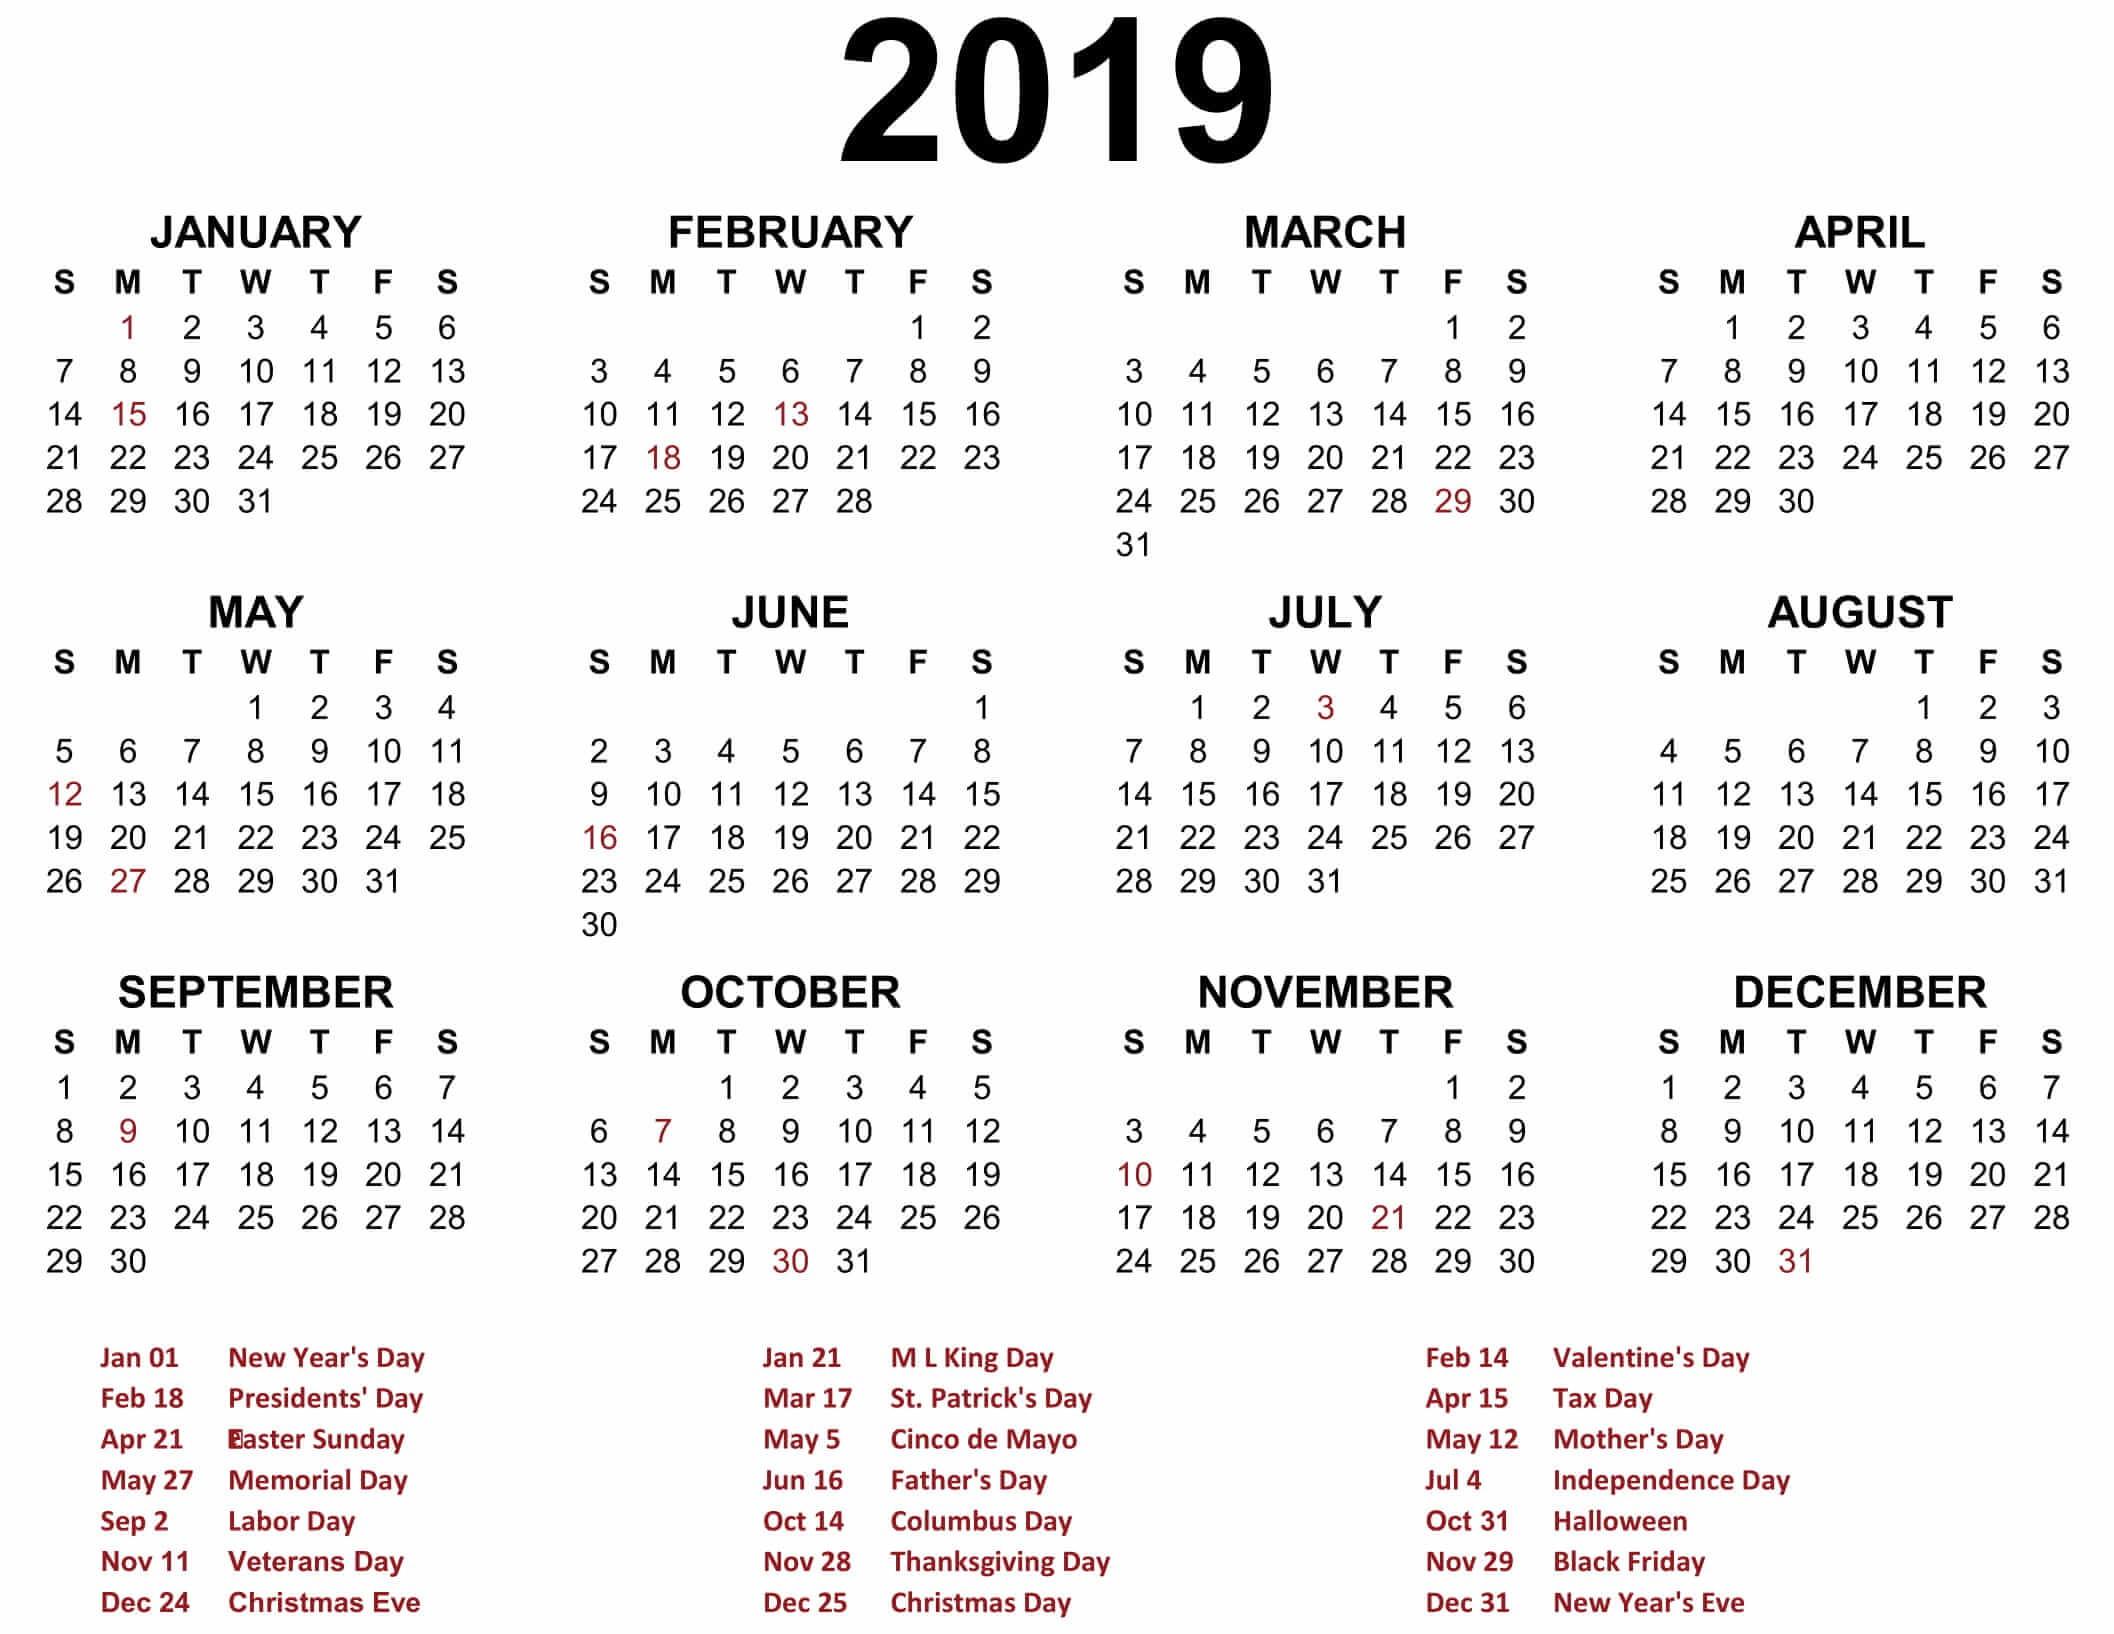 2019 Calendar Printout Printable Blank 2019 Calendar Templates Calenndar